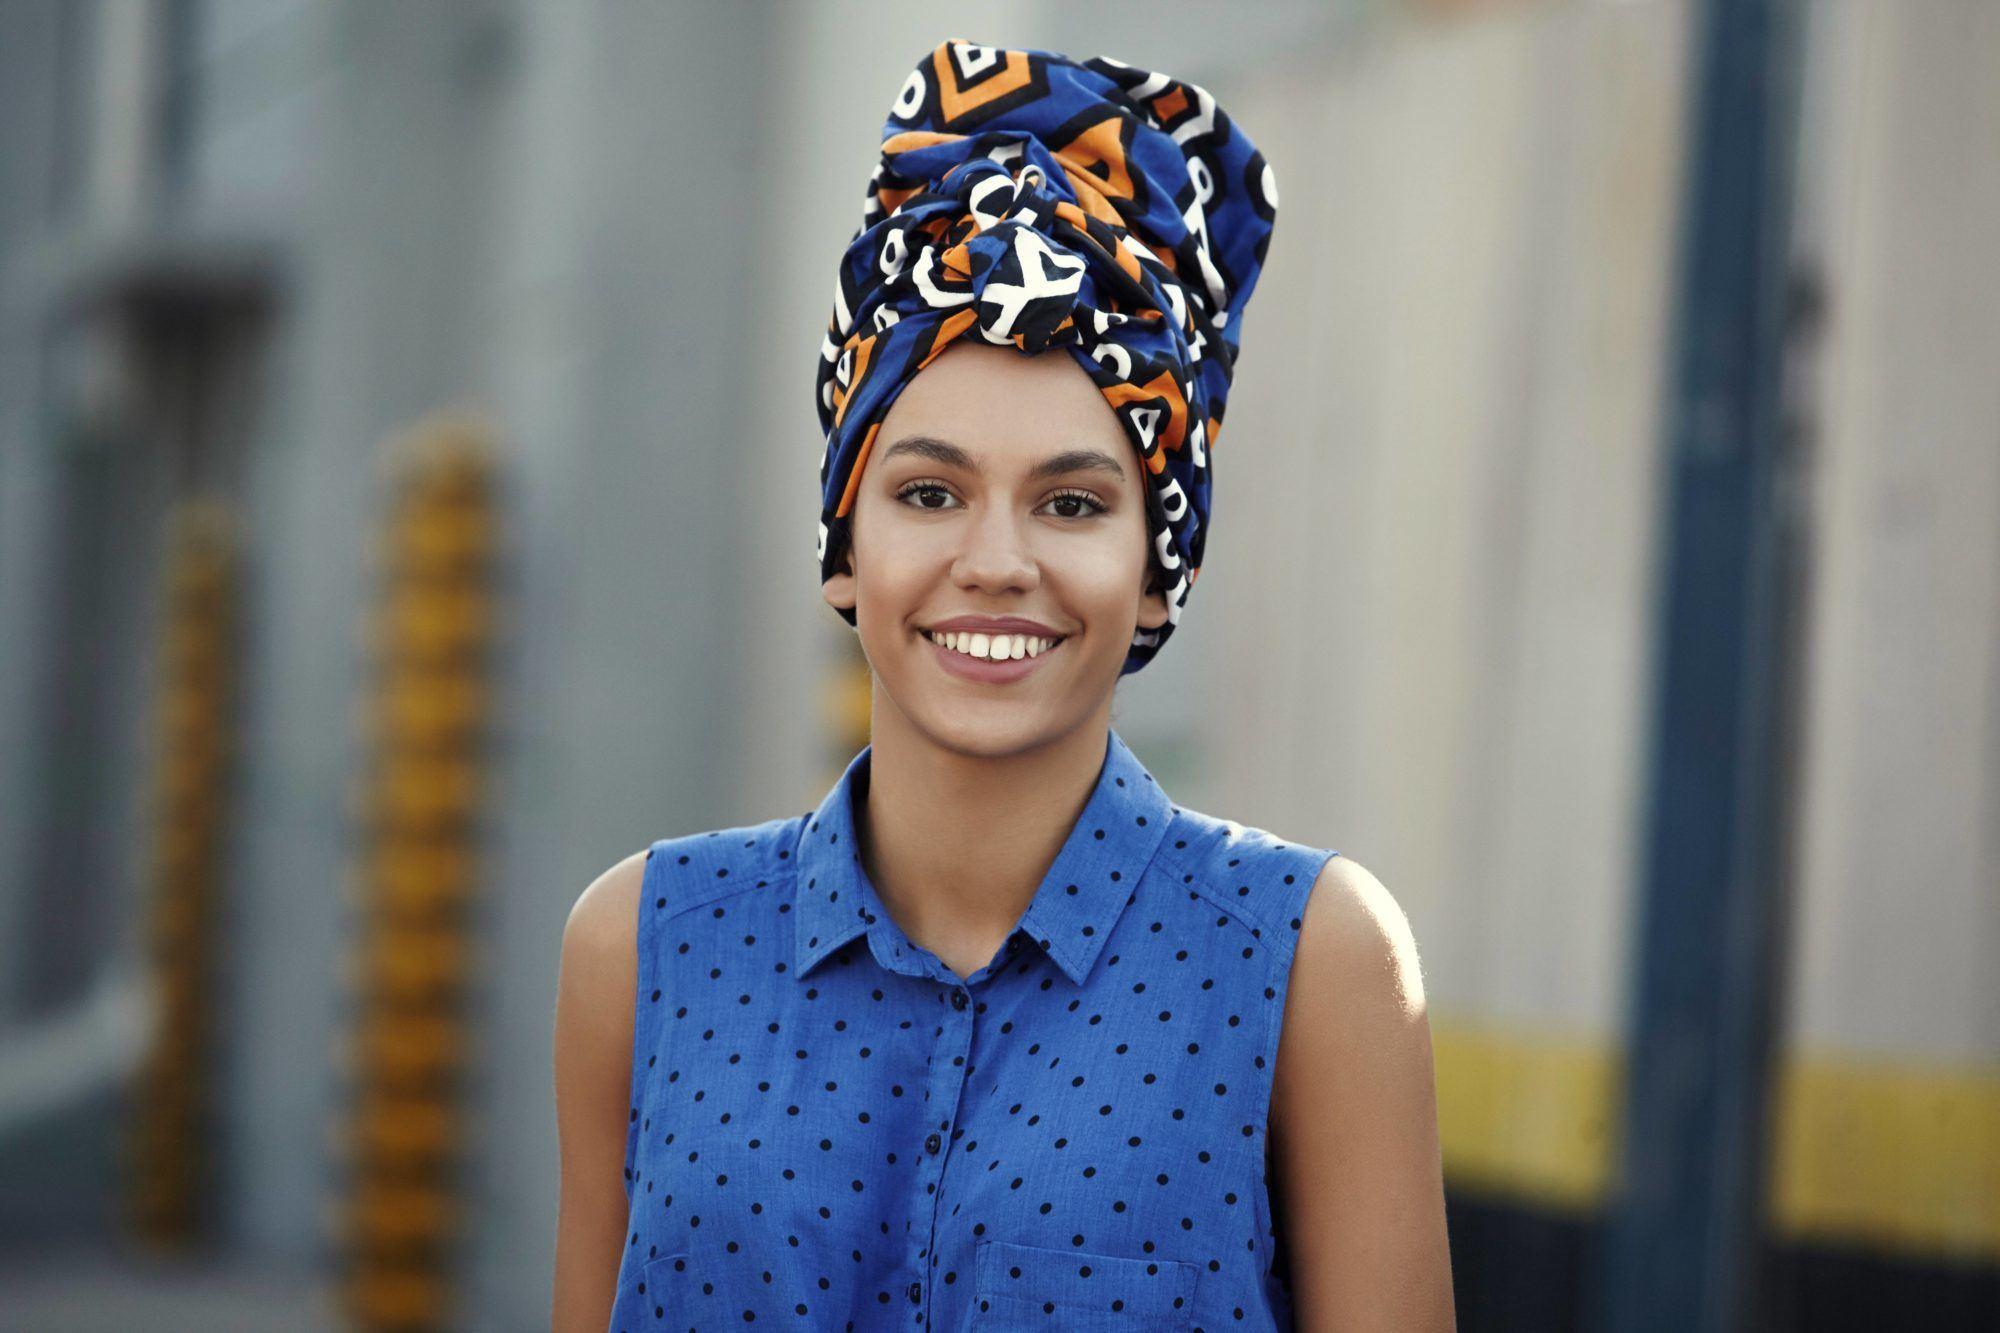 Wanita hispanic dengan gaya rambut turban etnik